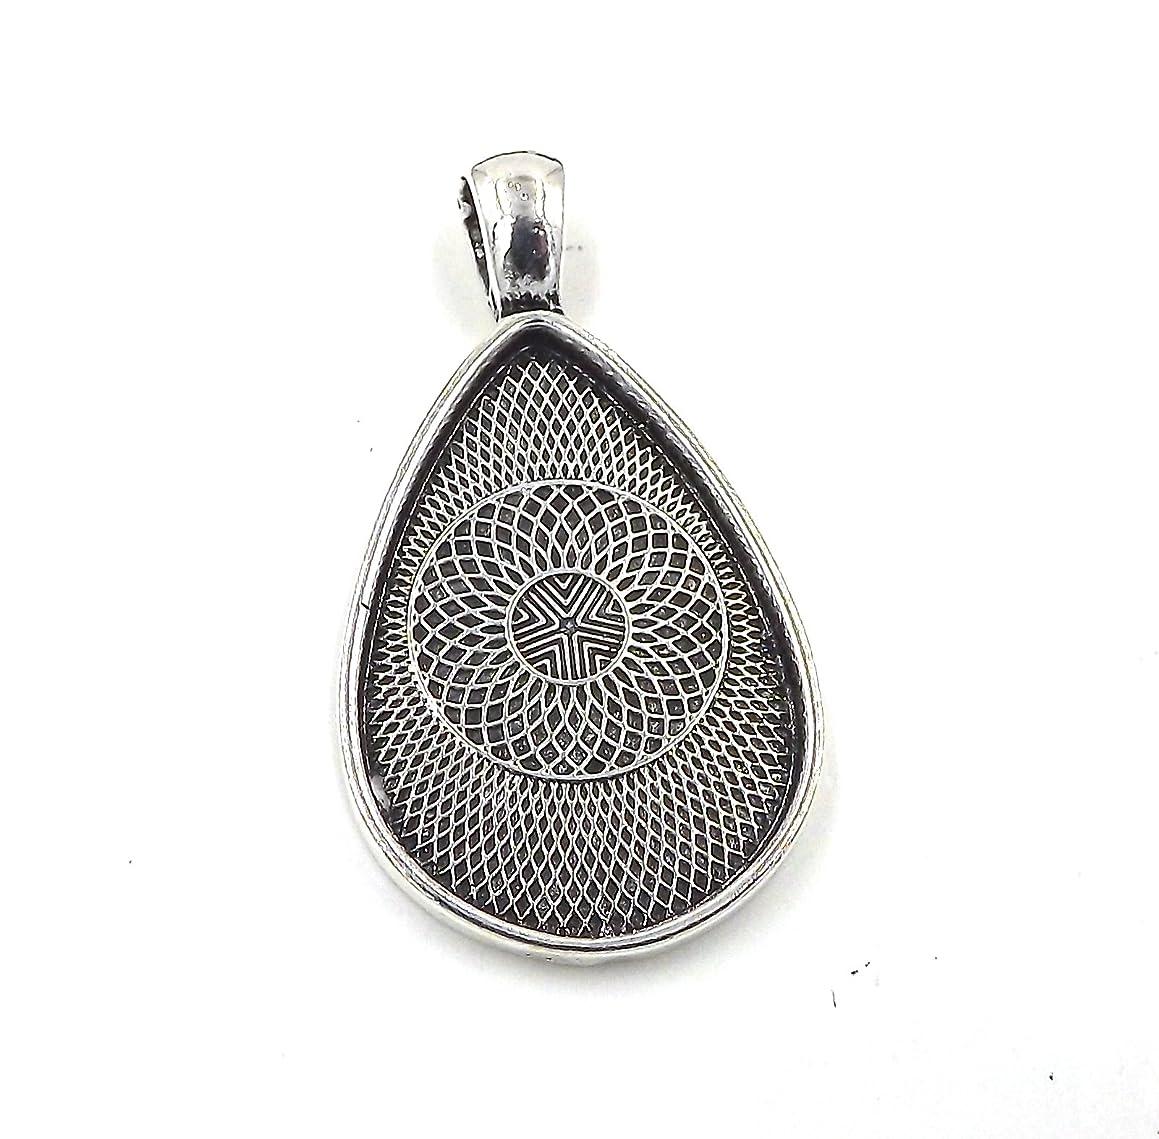 20 Deannassupplyshop Teardrop oval Pendant Trays -Antique Silver Color - 20X30mm - Pendant Blanks Cameo Bezel Settings Photo Jewelry - Custom Jewelry Making